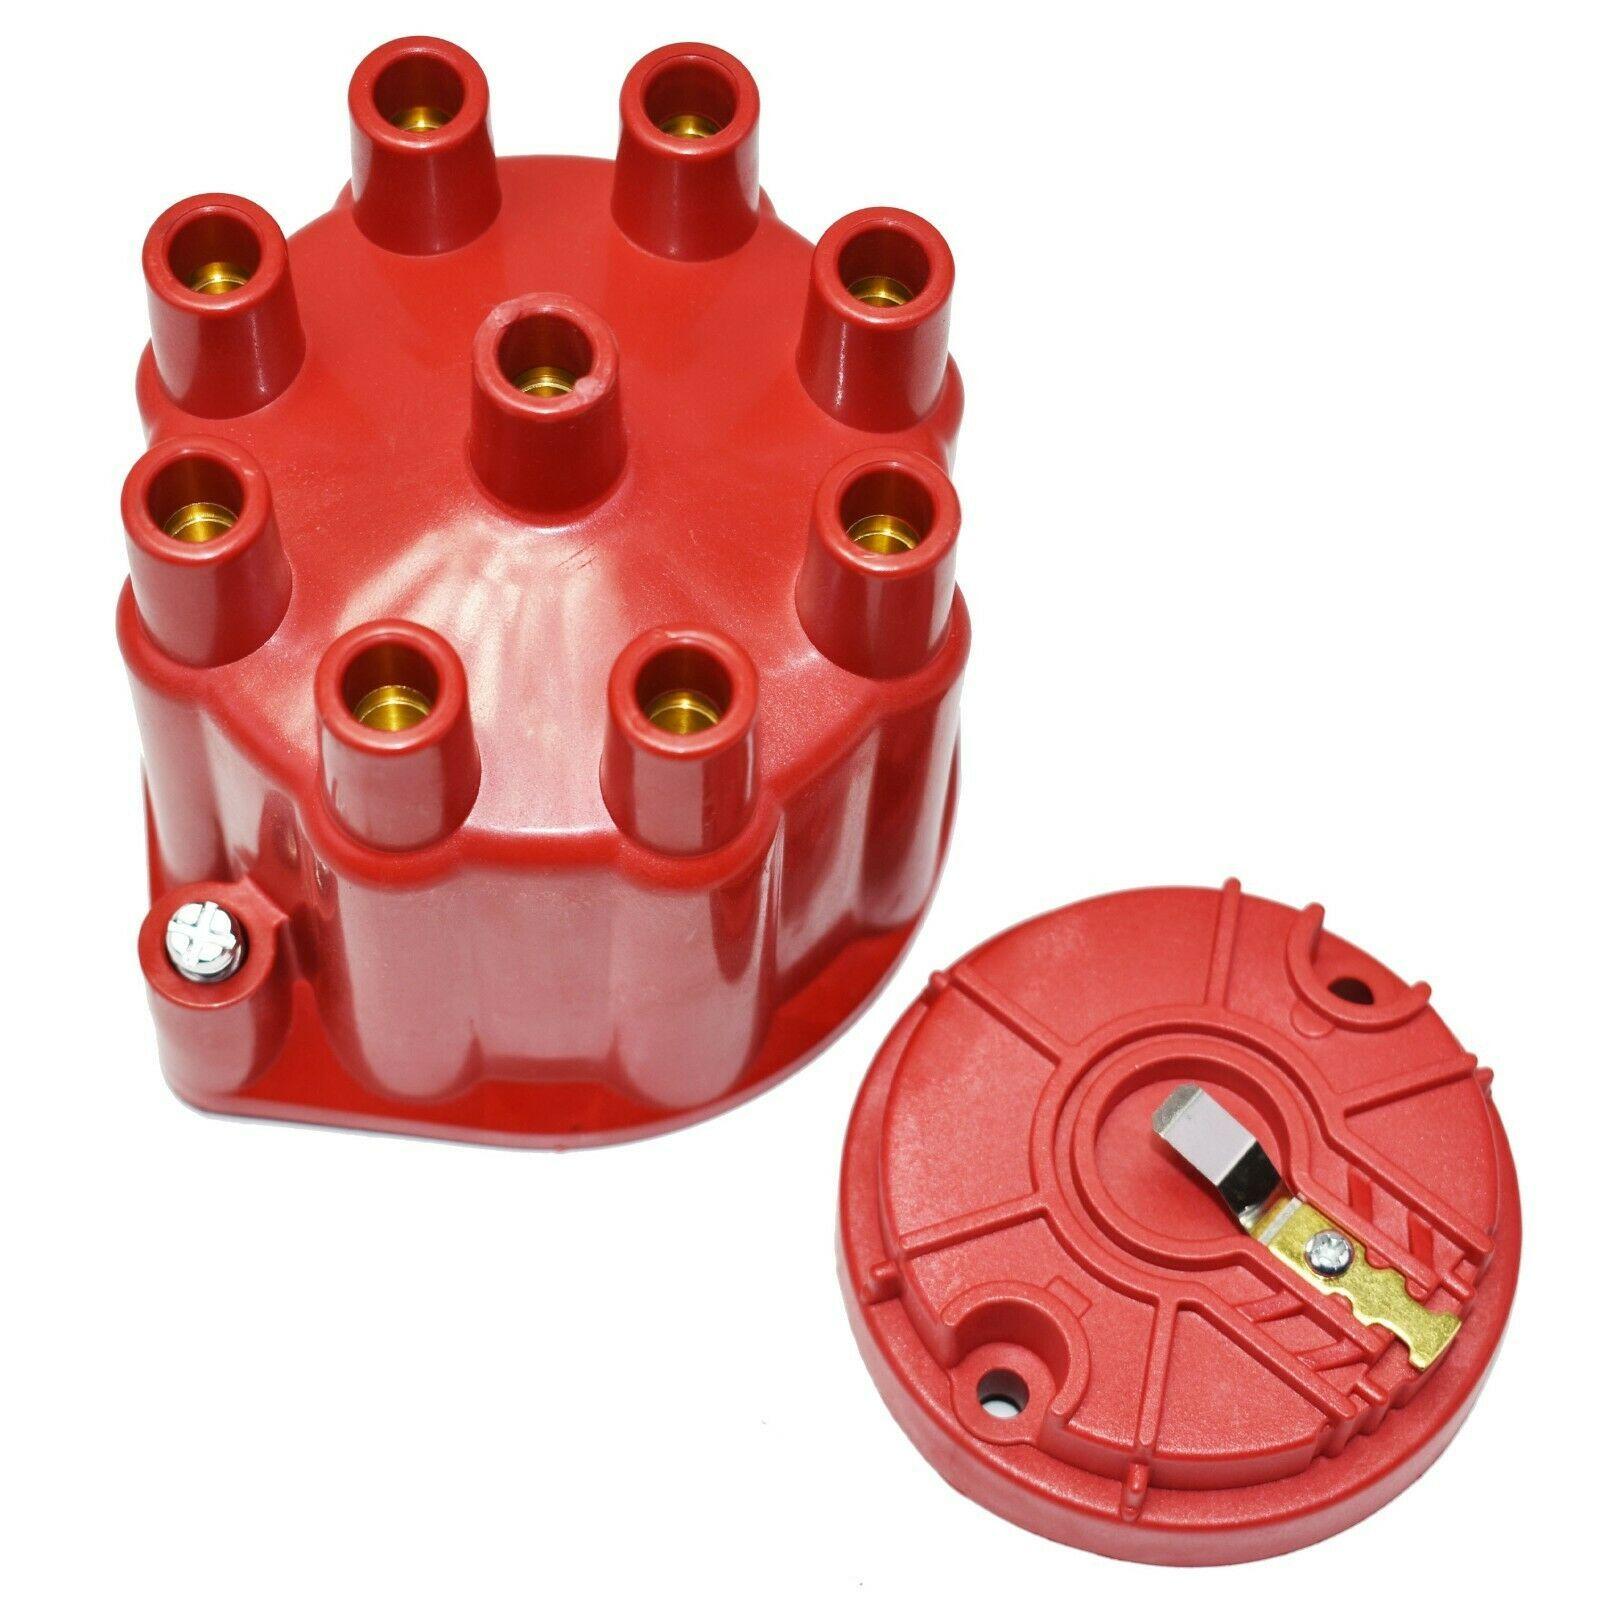 8-Cylinder Female Pro Series Distributor Cap & Rotor Kit (Red)